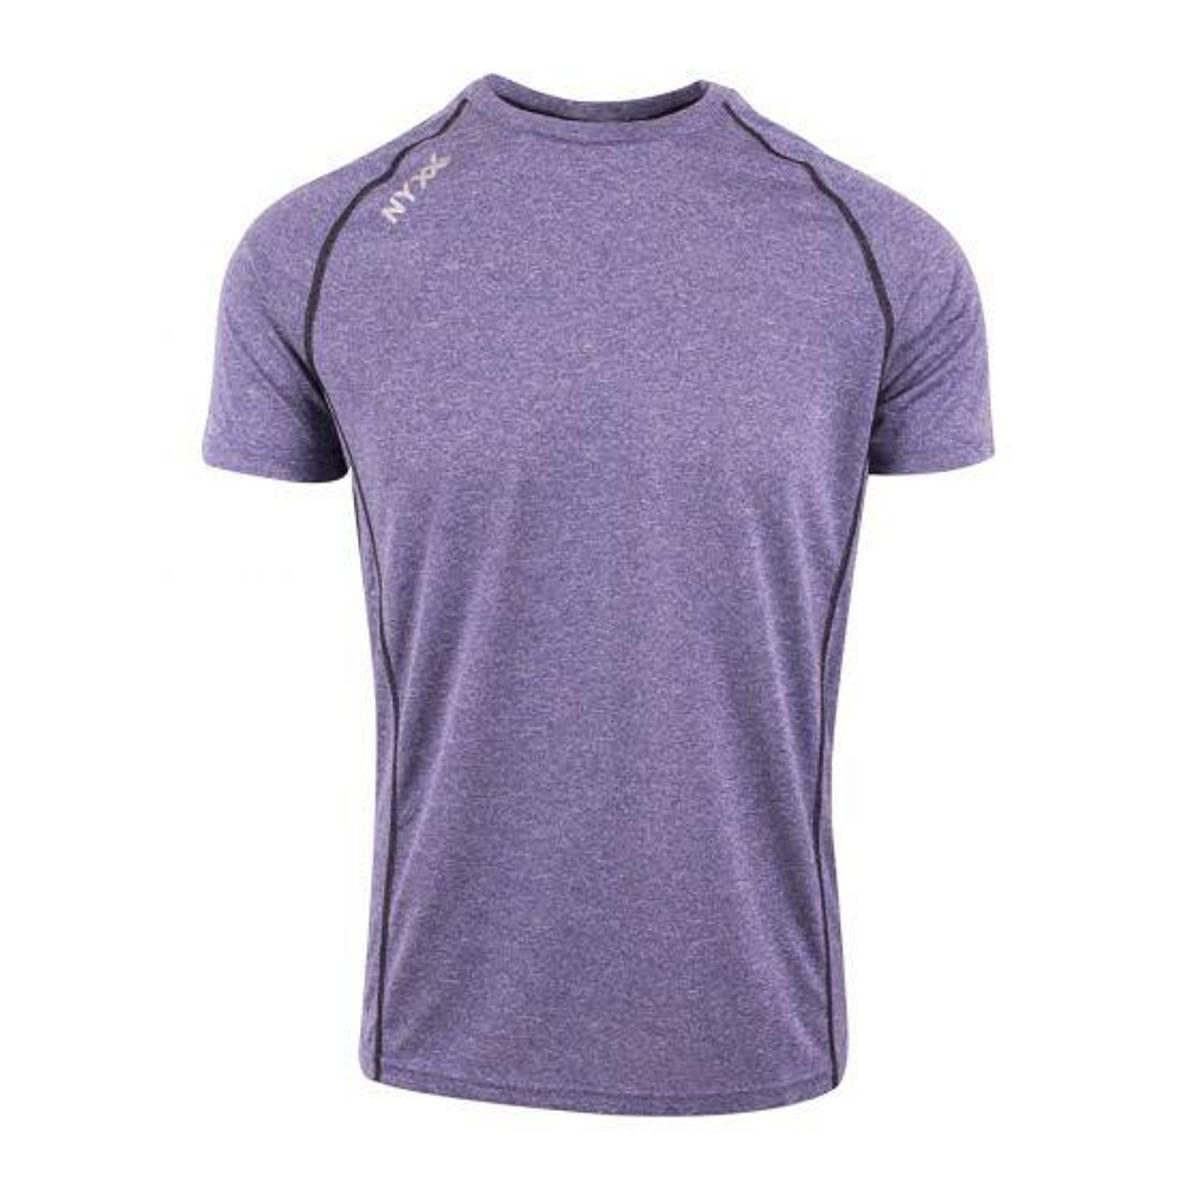 T-skjorte, X-treme, herre, lys lilla Str. XL